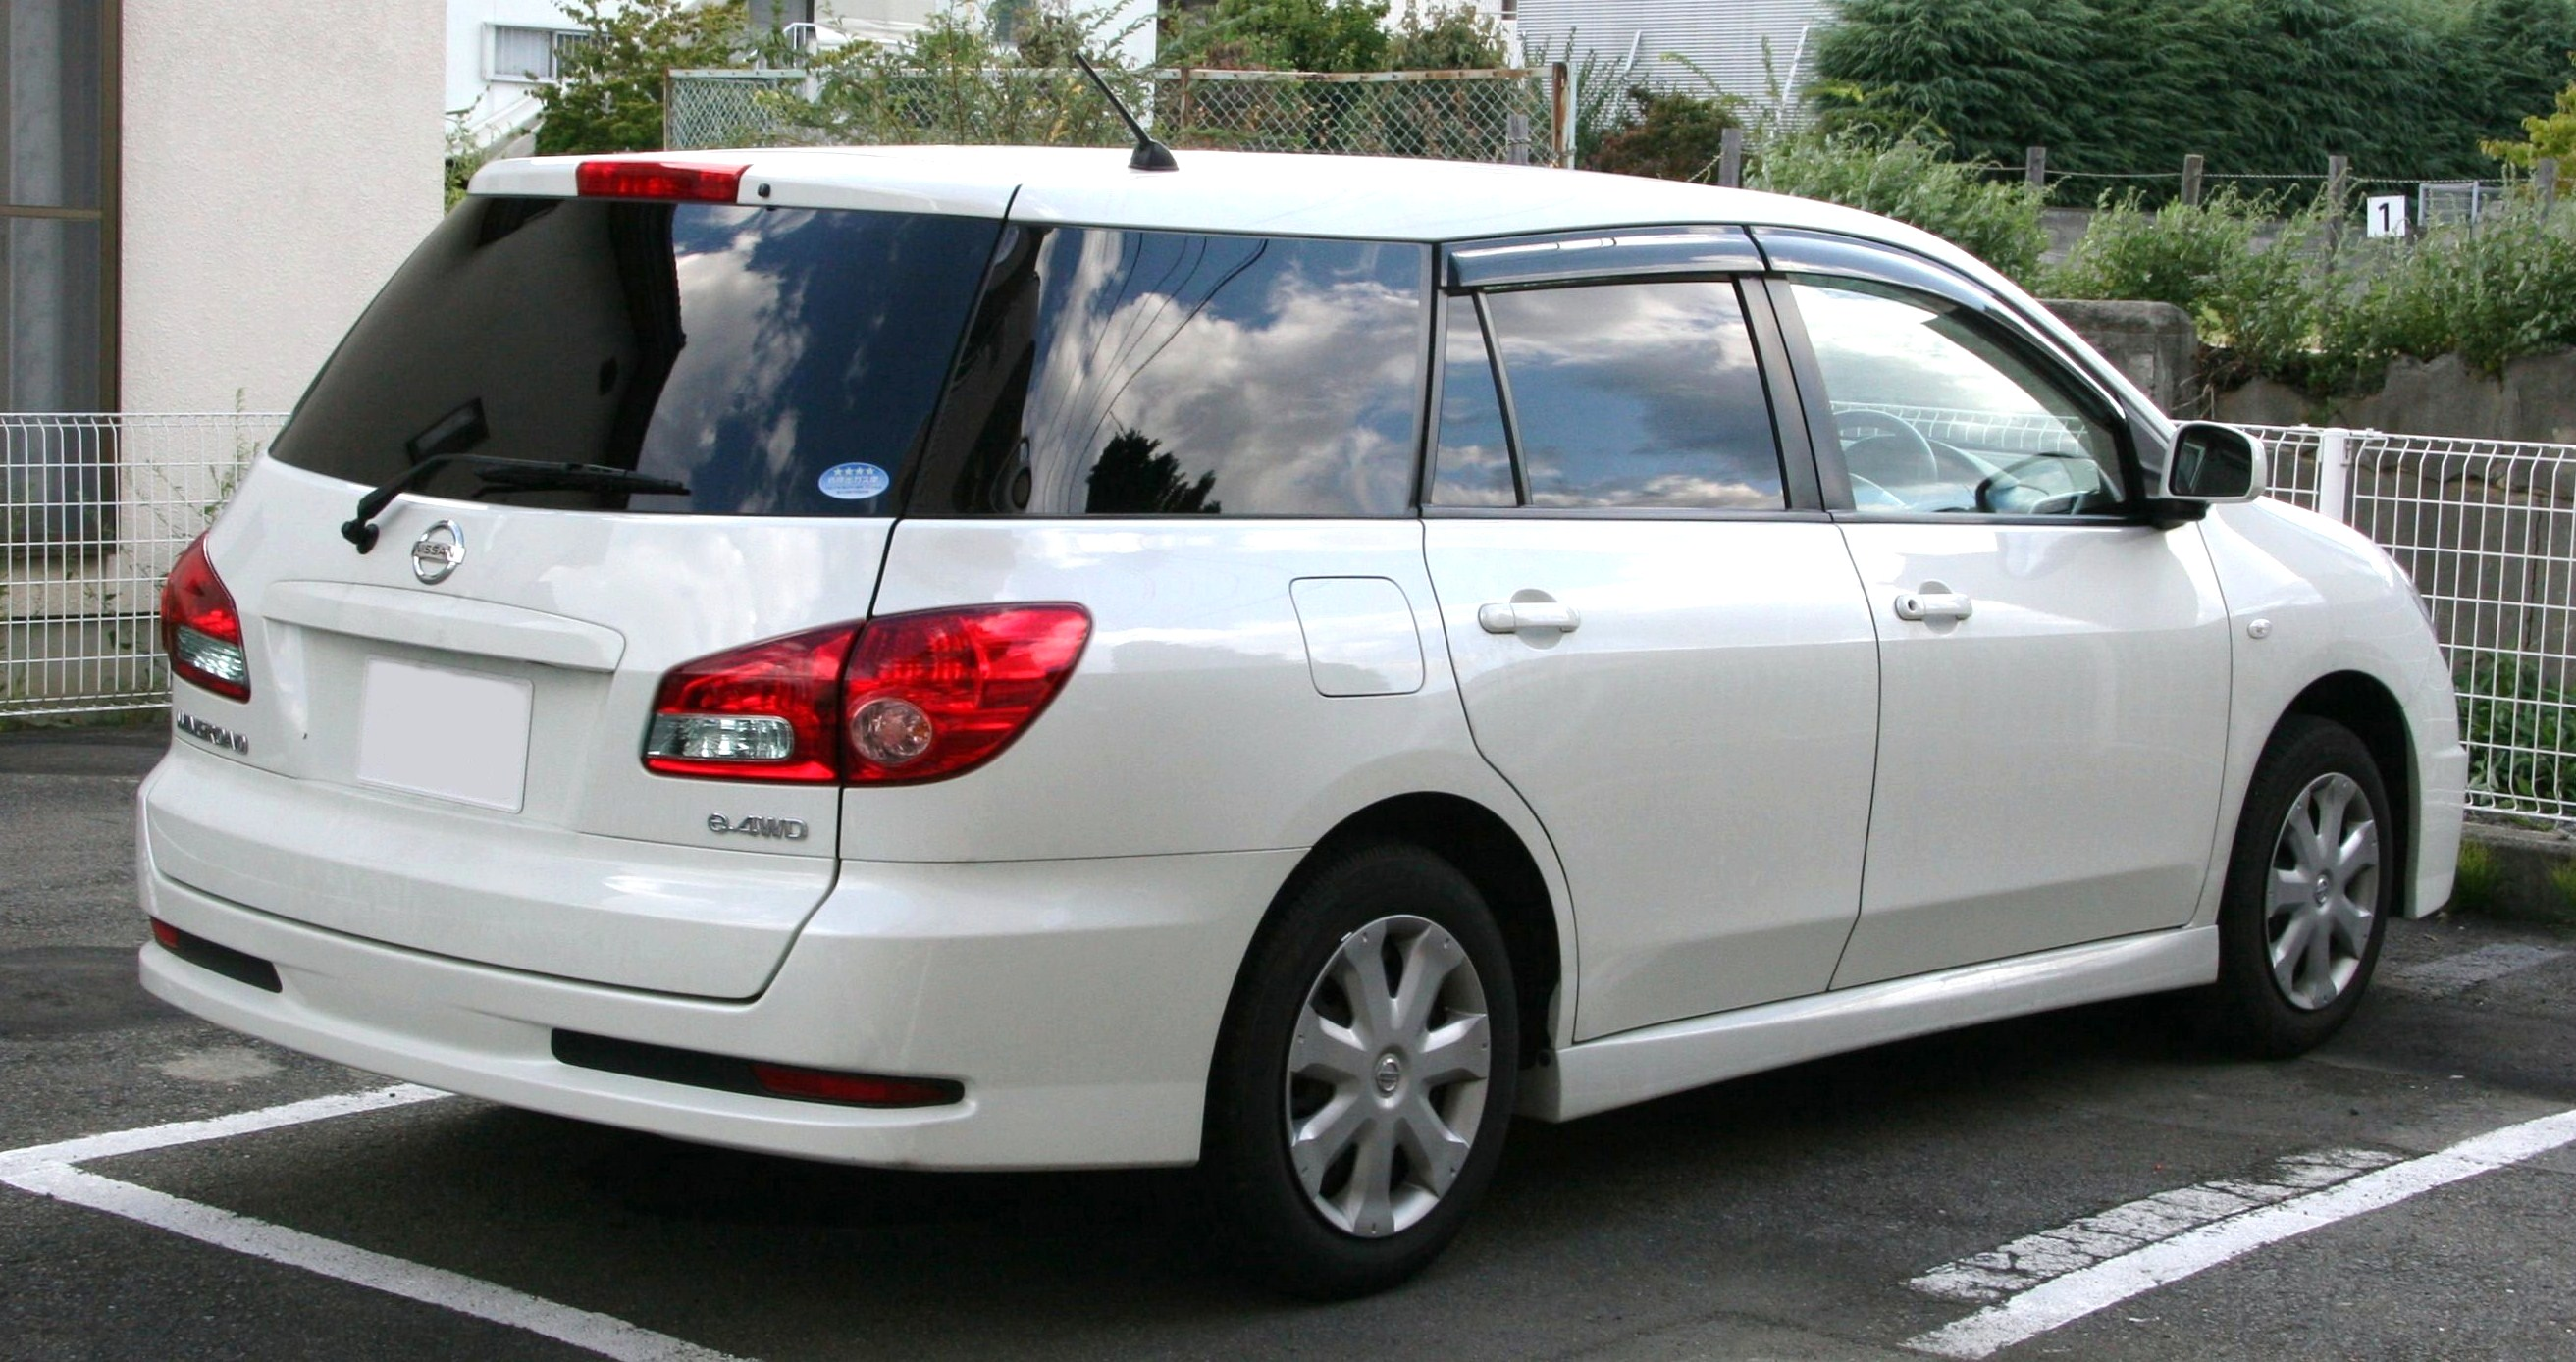 Nissan Wingroad III (Y12) 2005 - now Station wagon 5 door #6